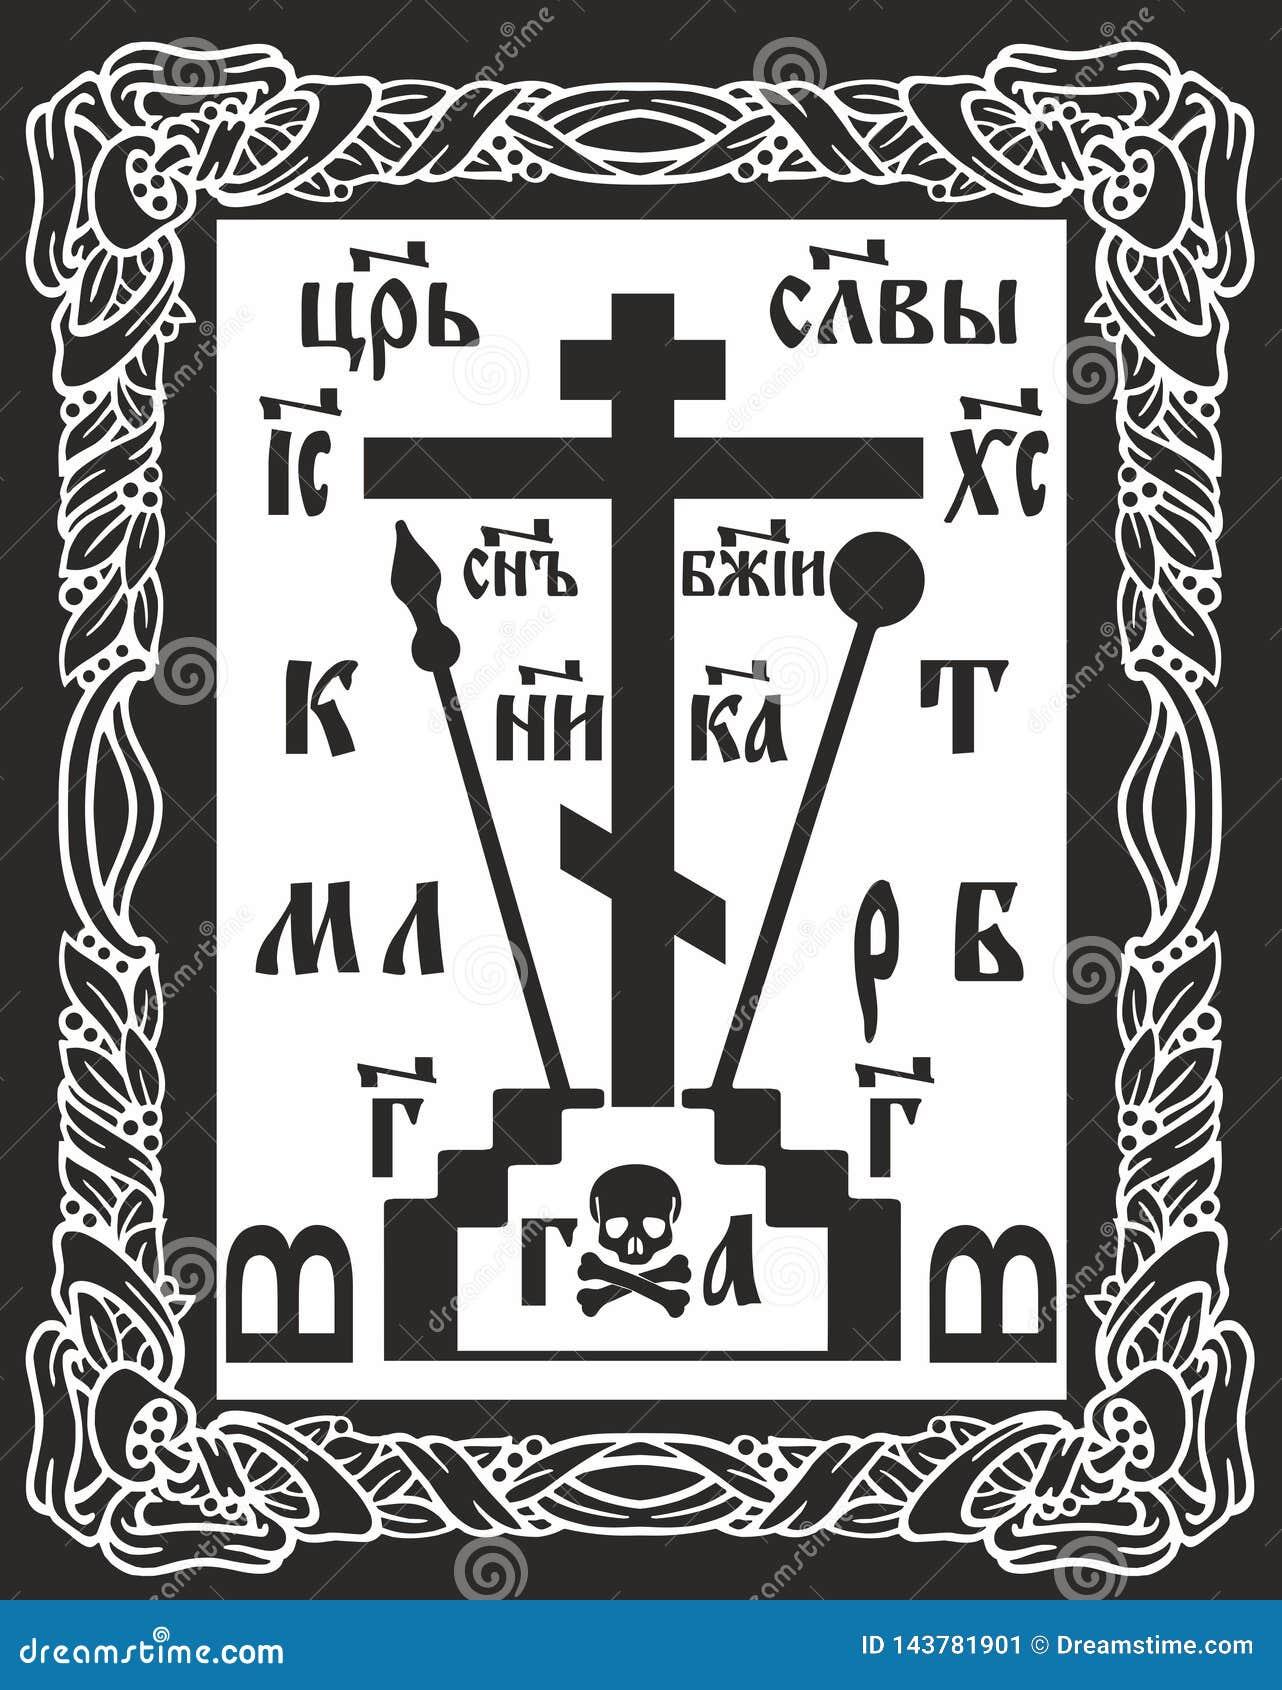 Clipart για να διακοσμήσει τις ταφόπετρες